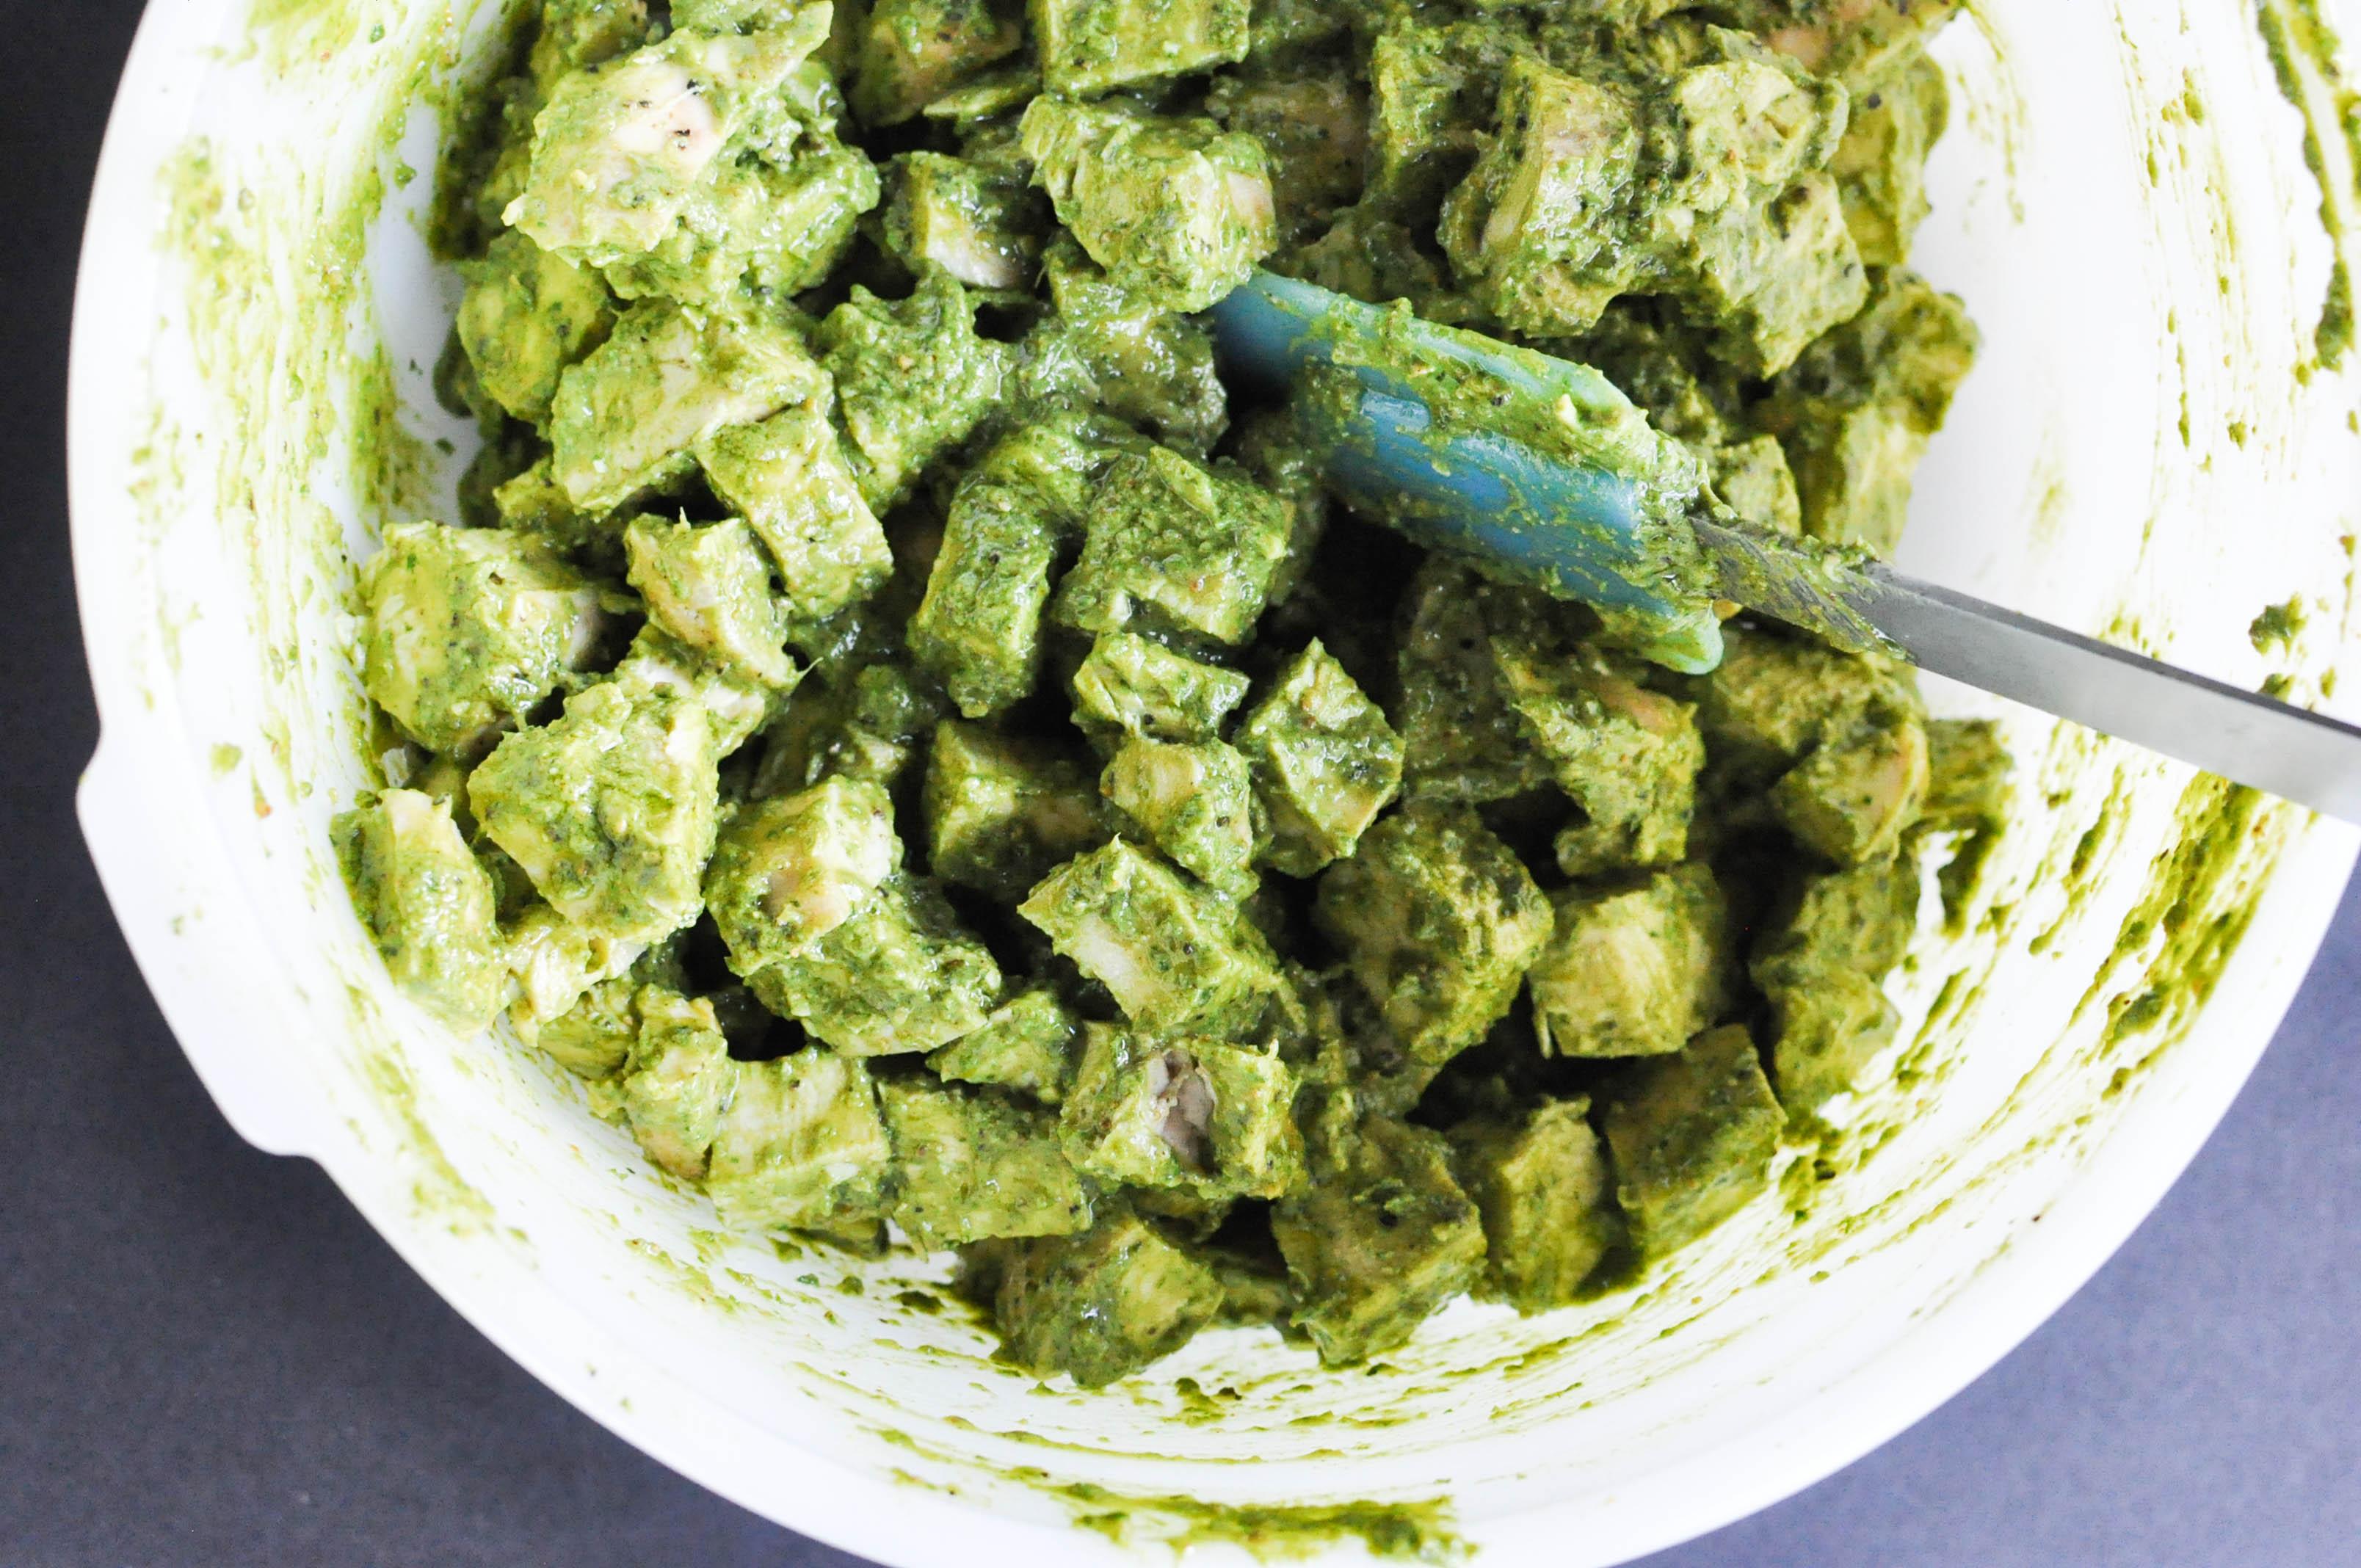 Paleo Chicken Pesto Salad - Fed